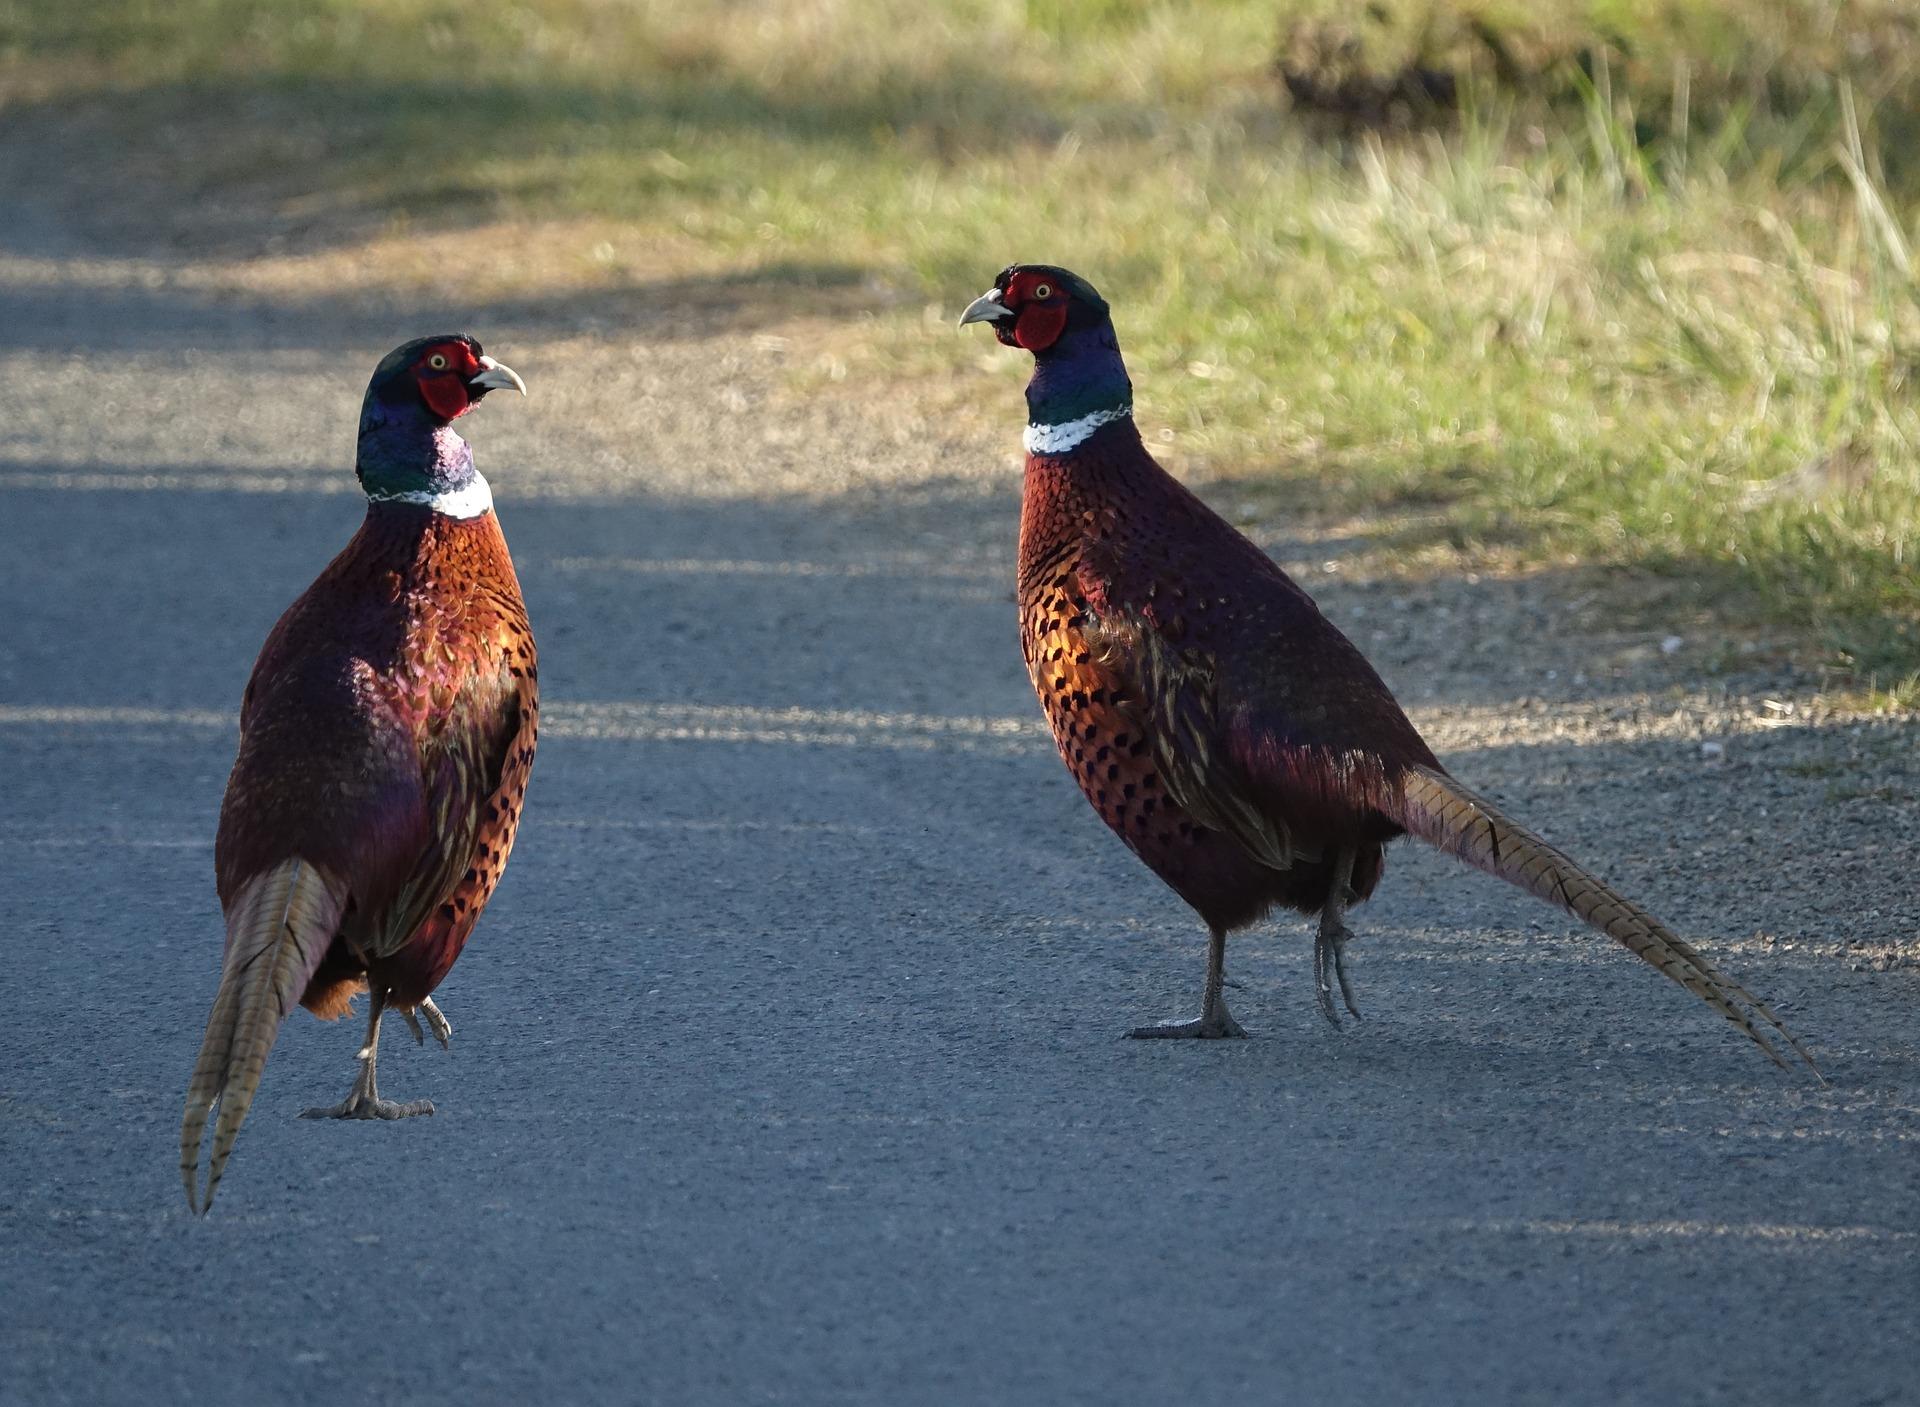 The Pheasants!